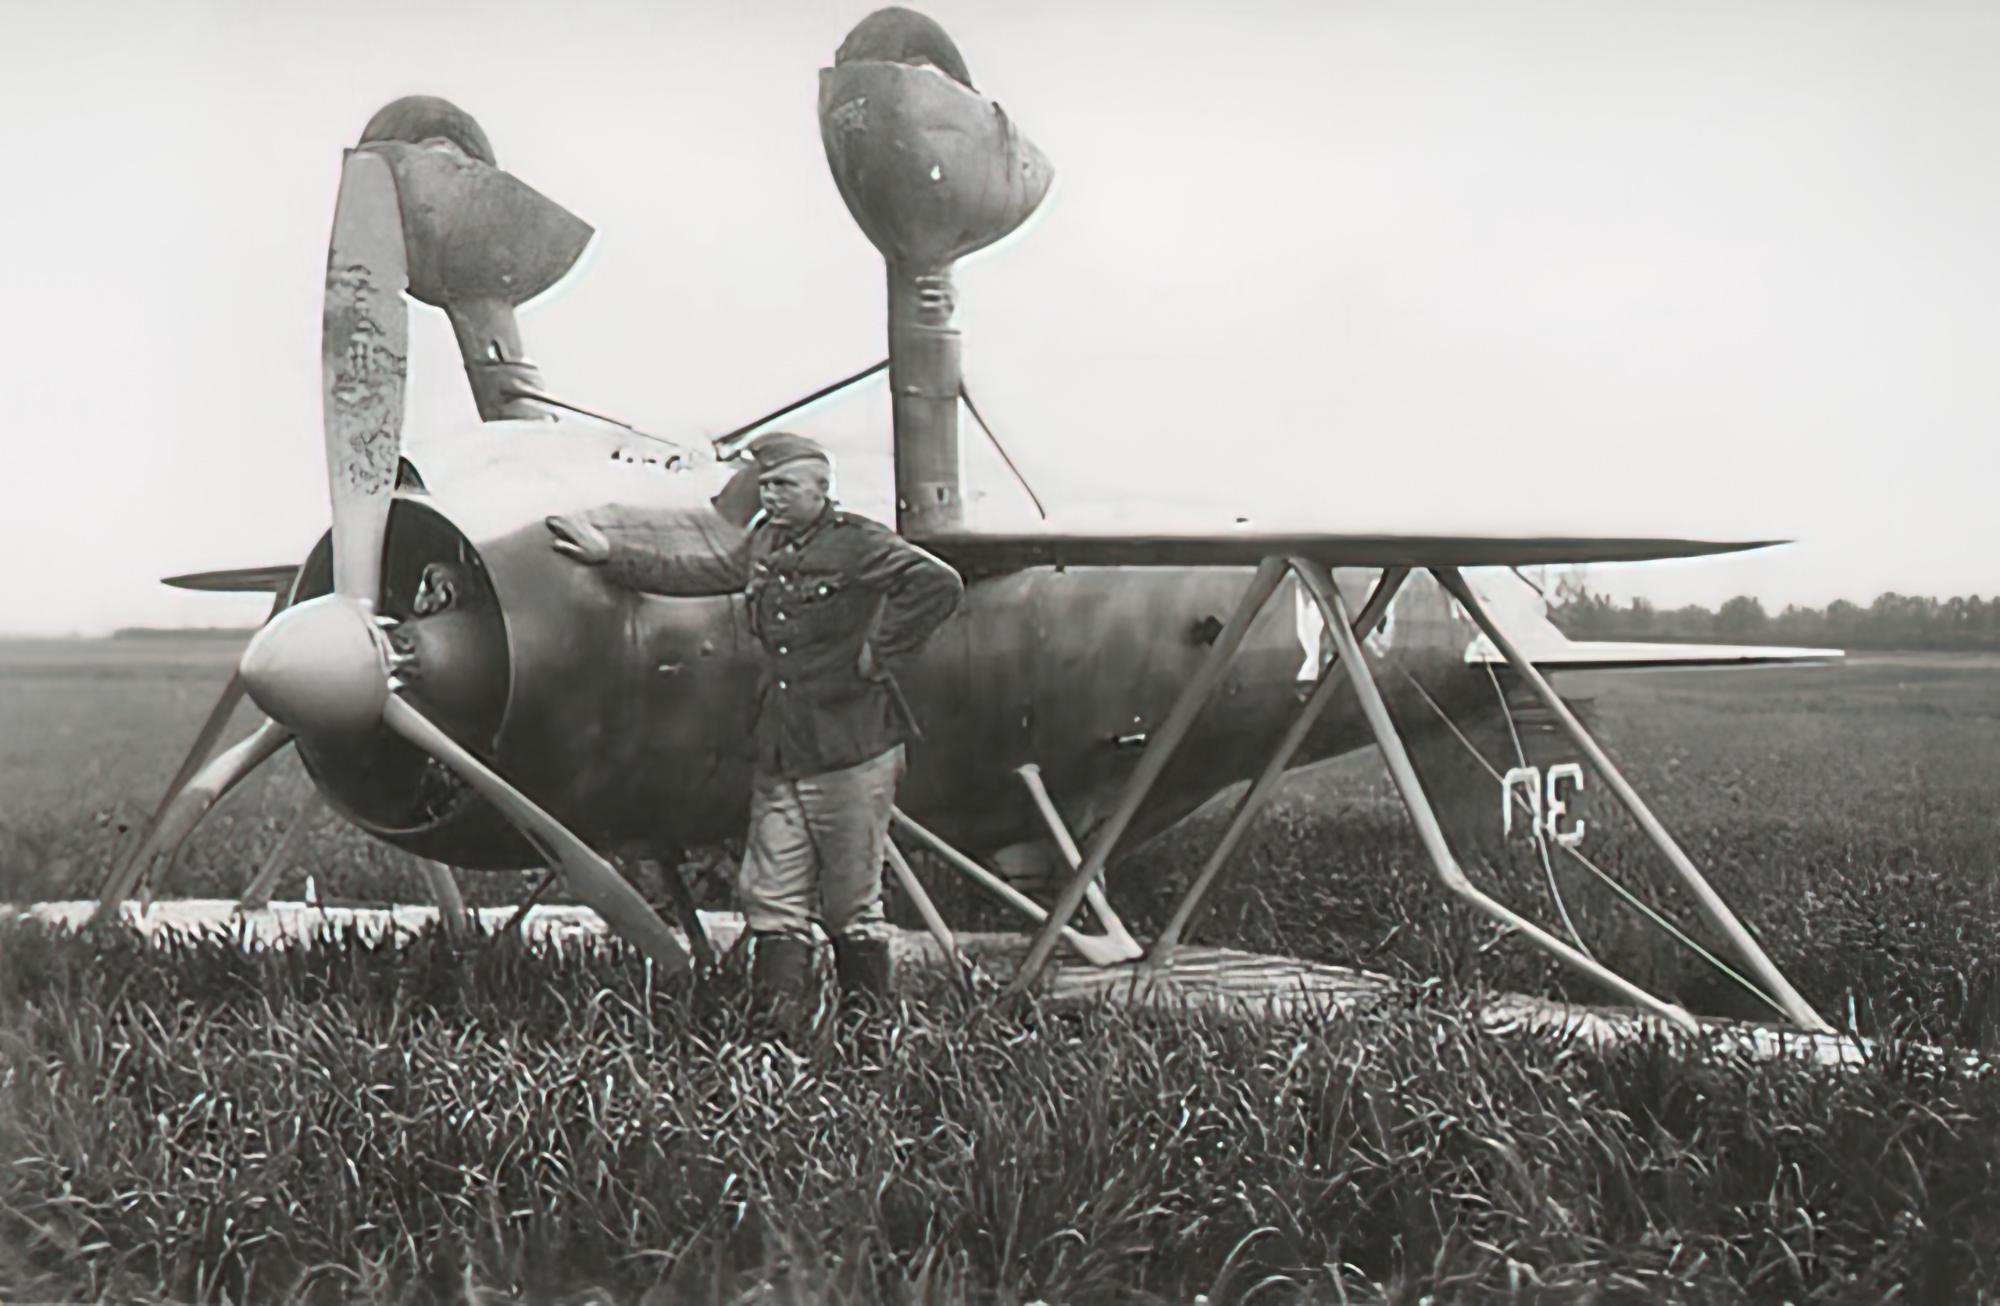 Fiat CR 42 Falco BAF IIFG3FS White 30 Luftwaffe captured Belgium 1940 01